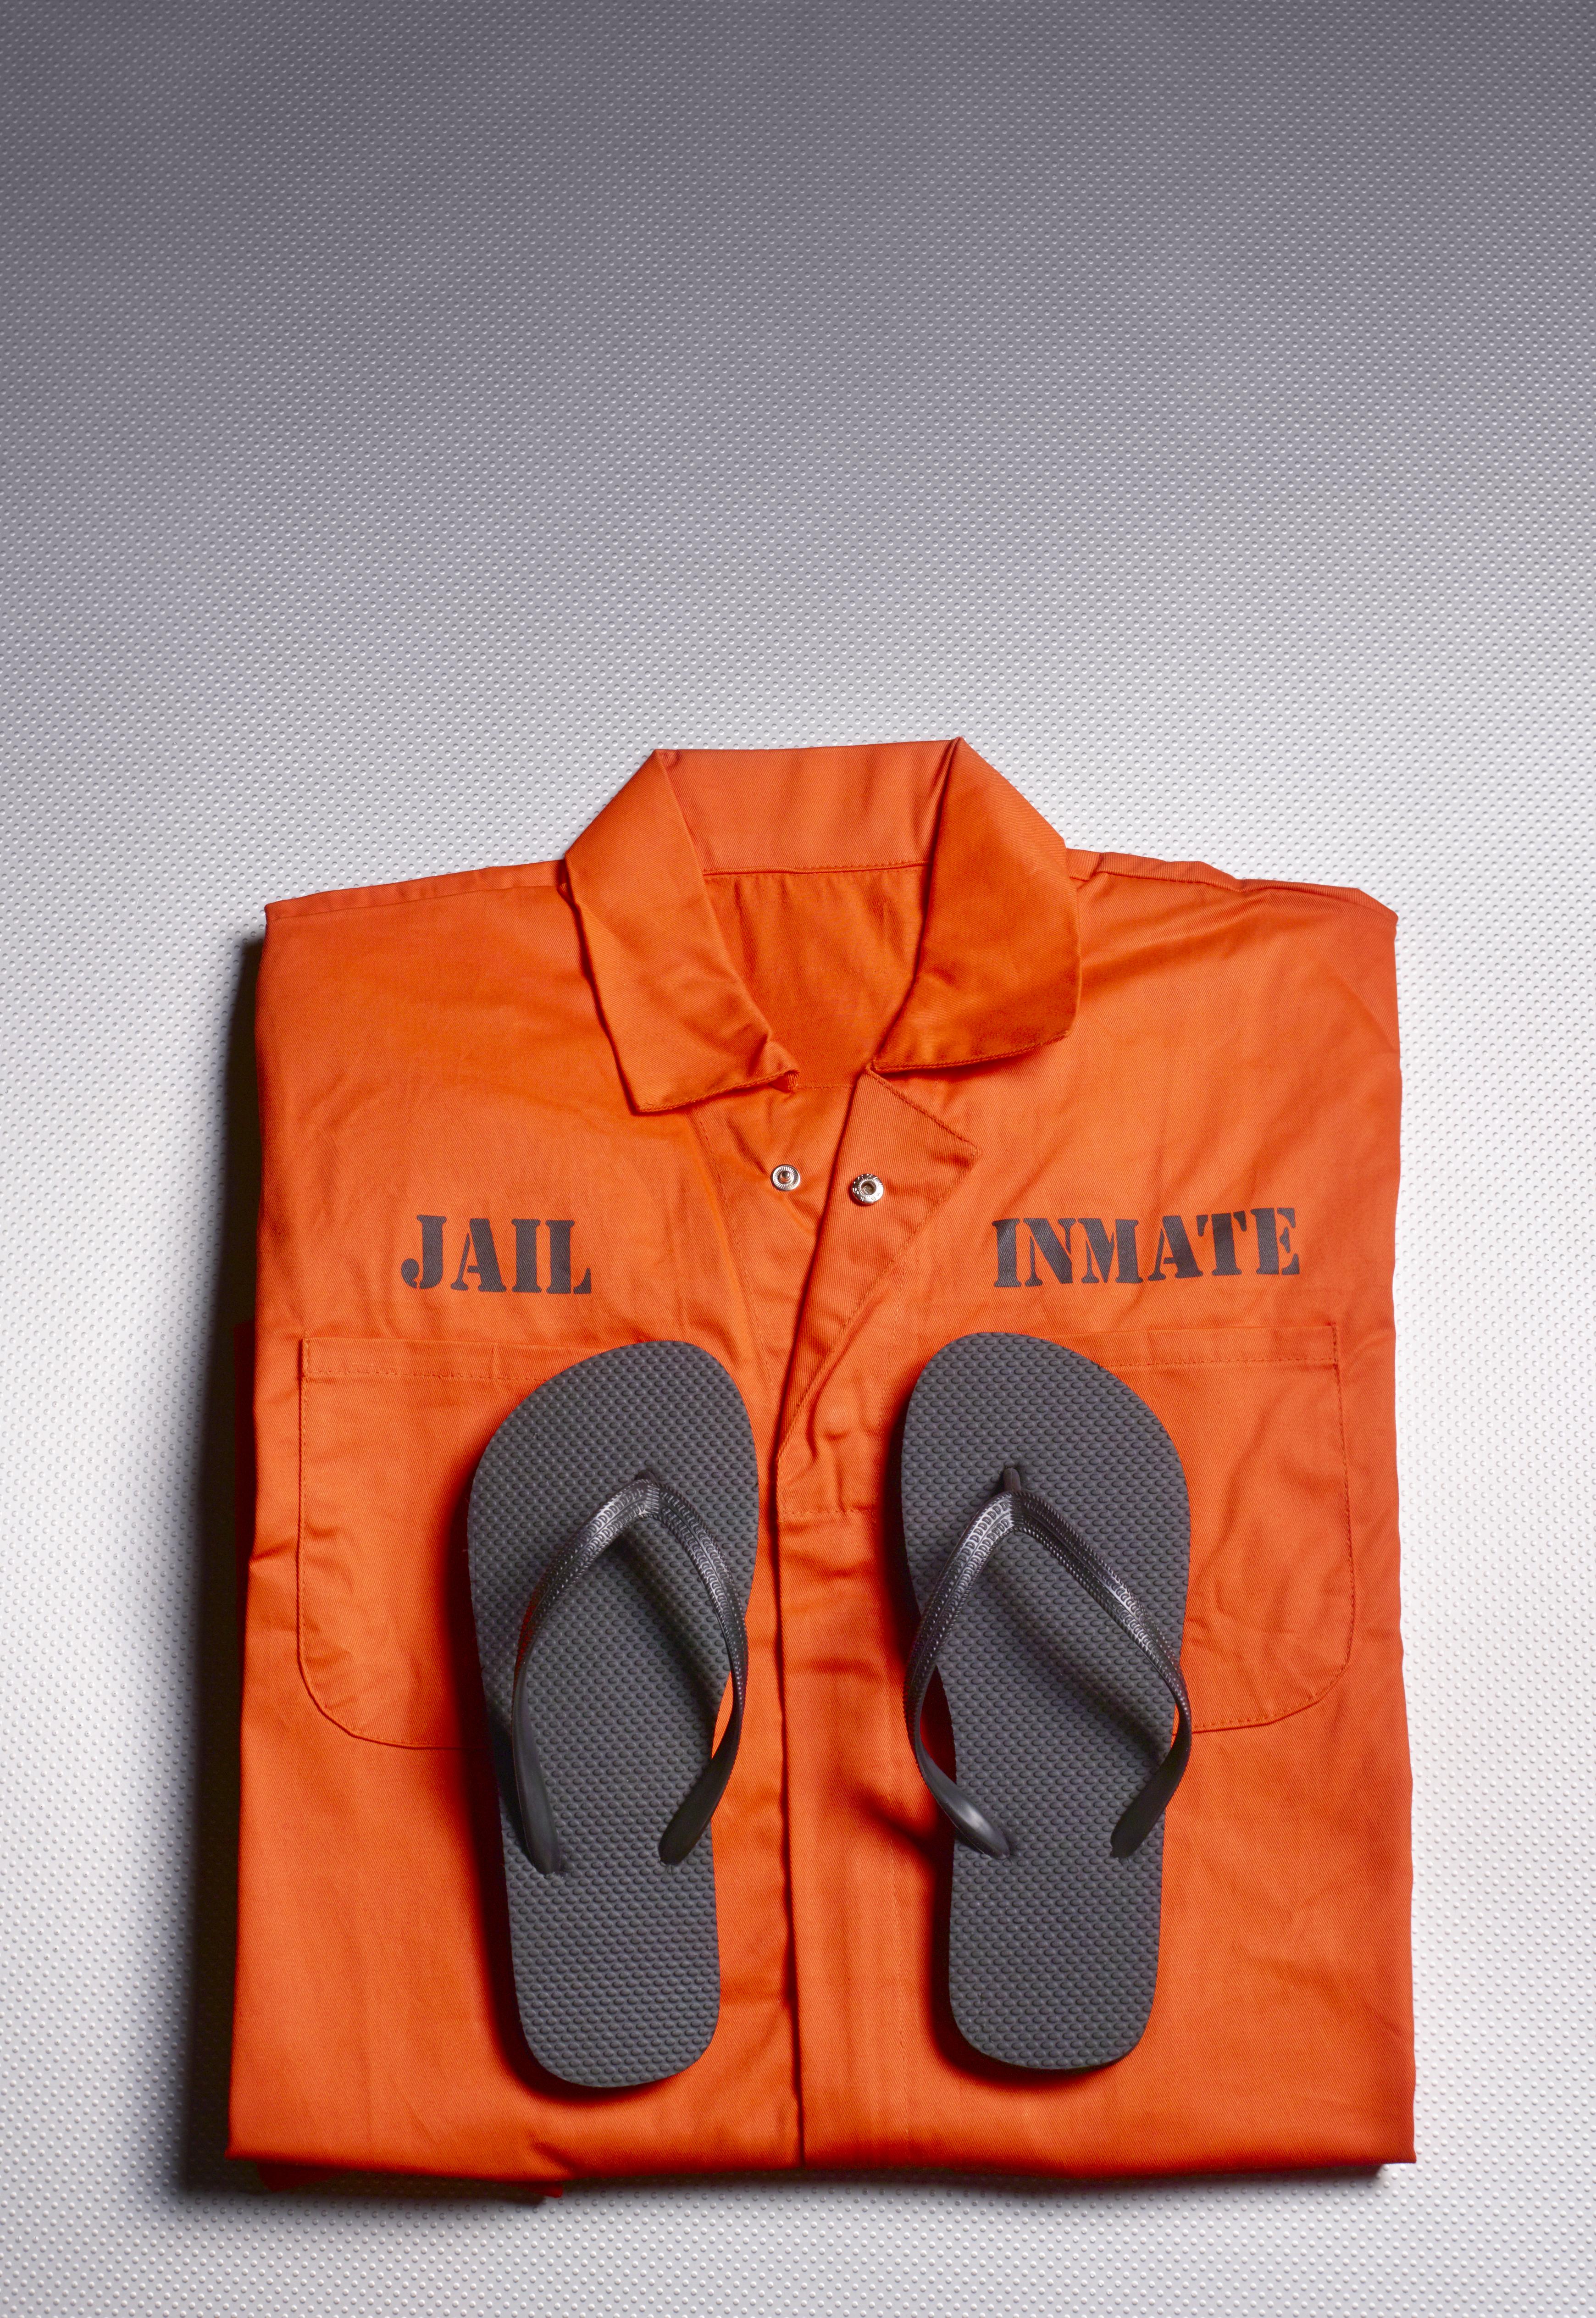 Orange jump suit in prison cell